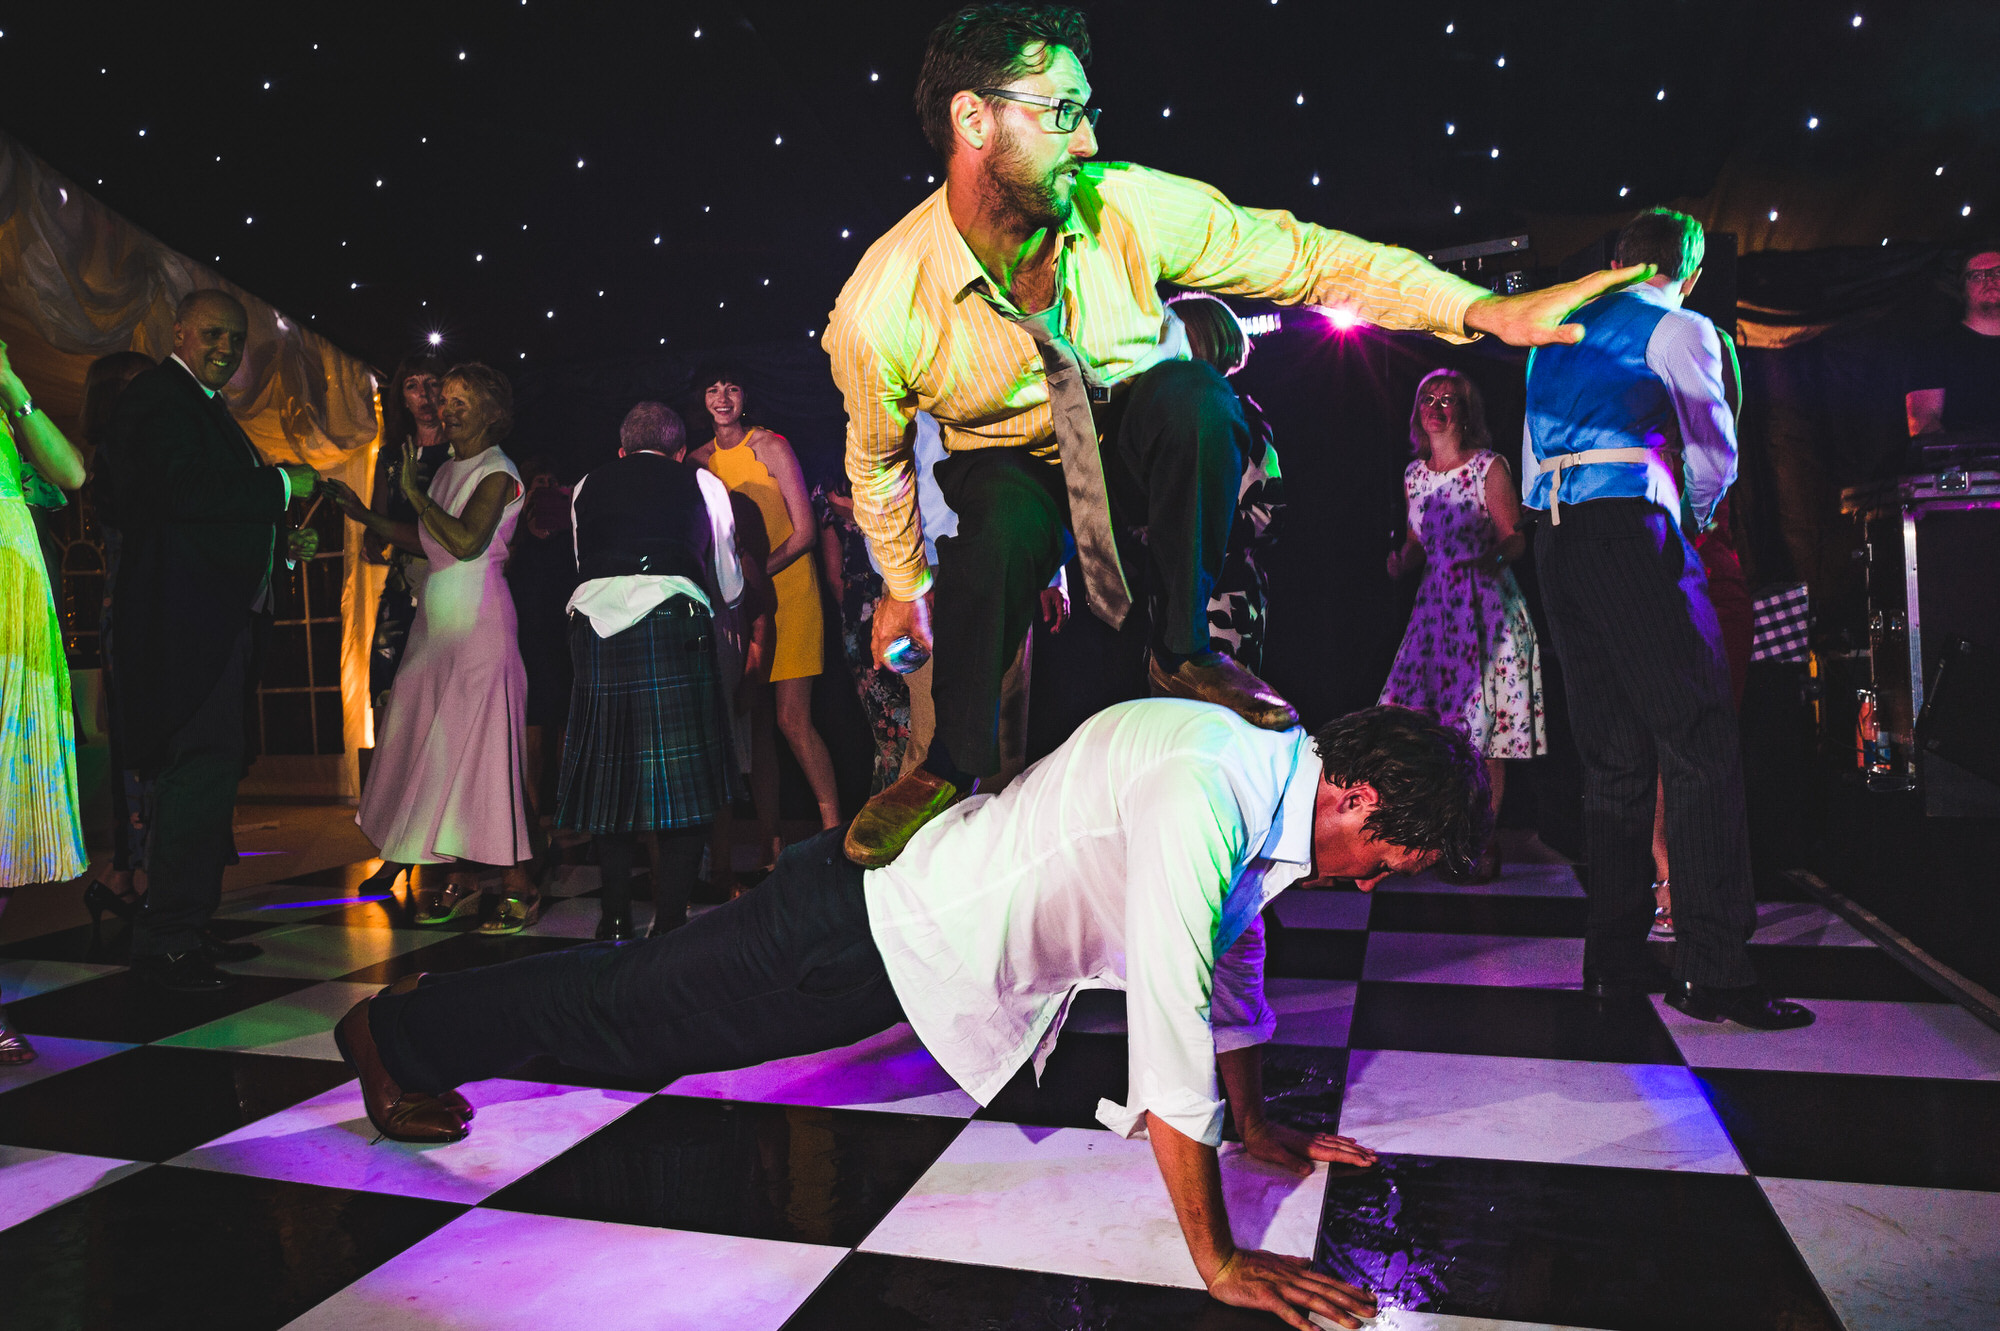 Dorset marquee wedding by the sea simon biffen photography 53